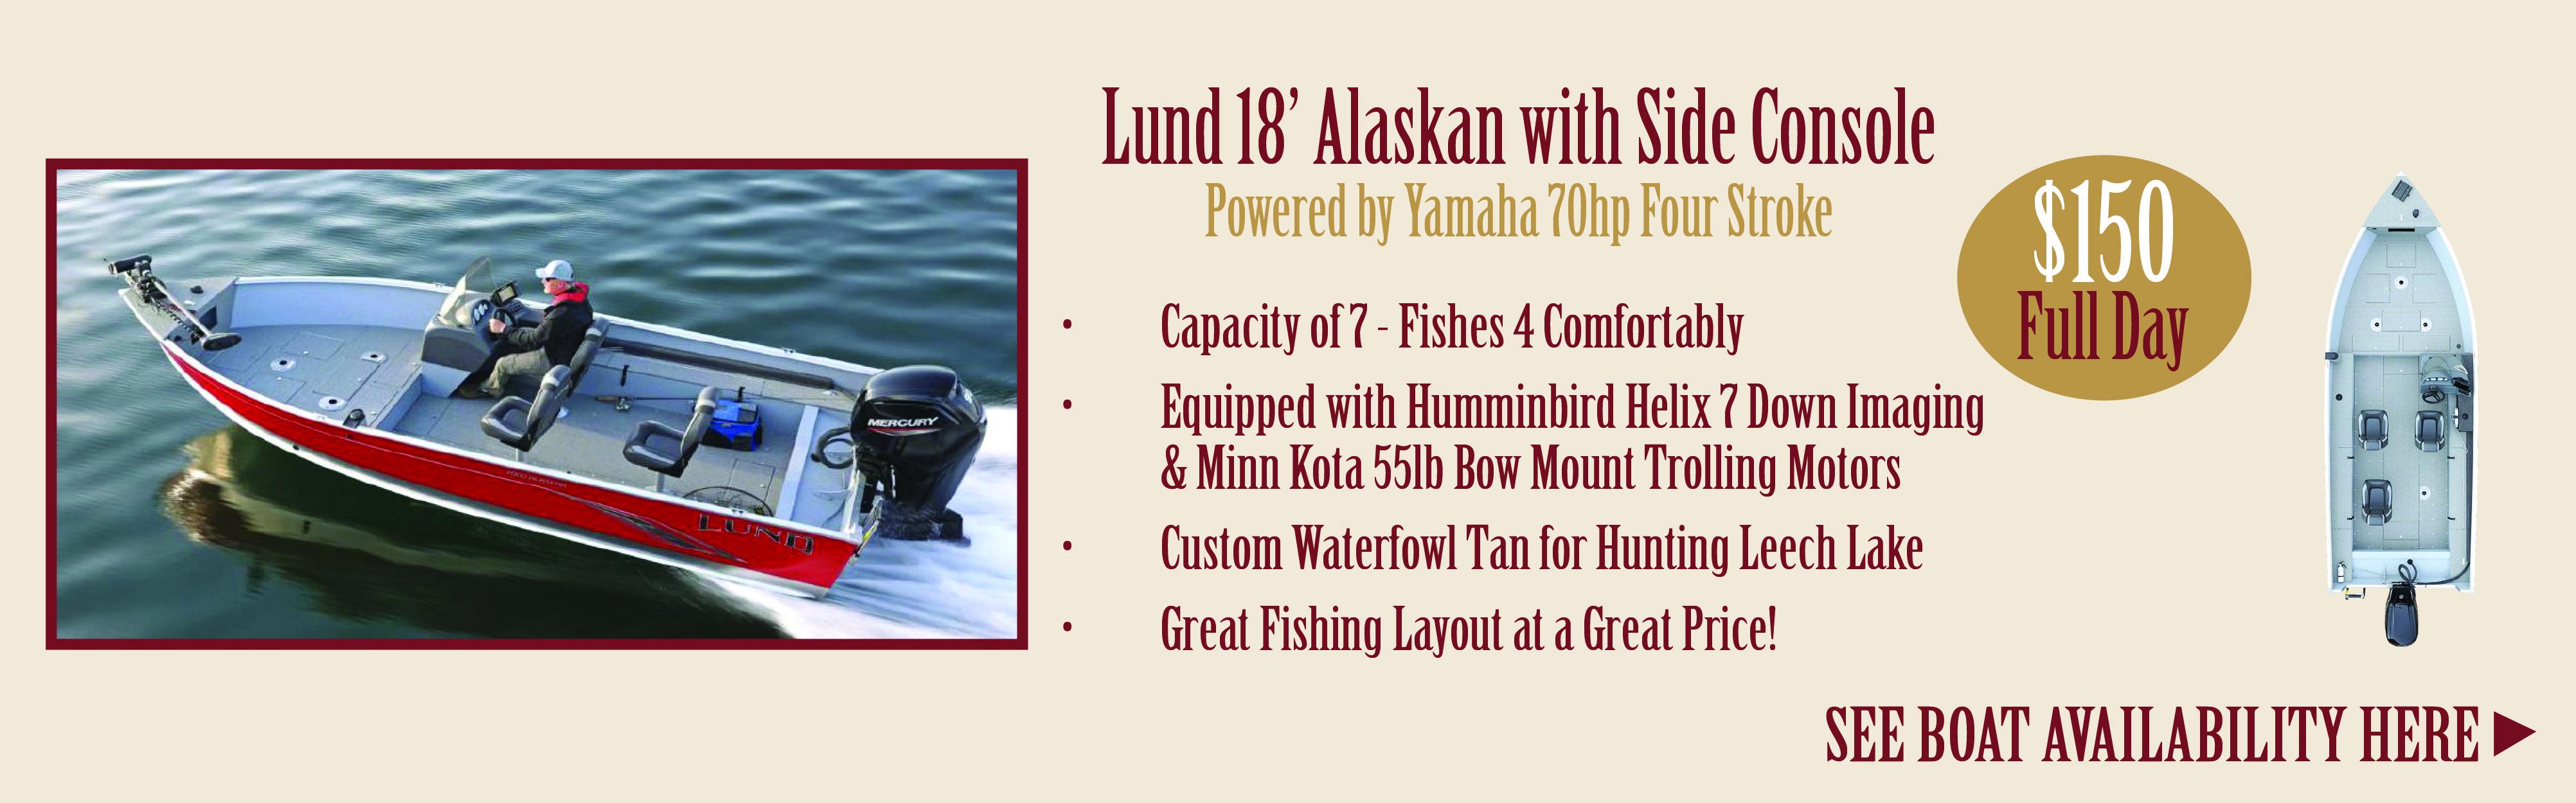 Leech Lake Fishing Boat Rentals